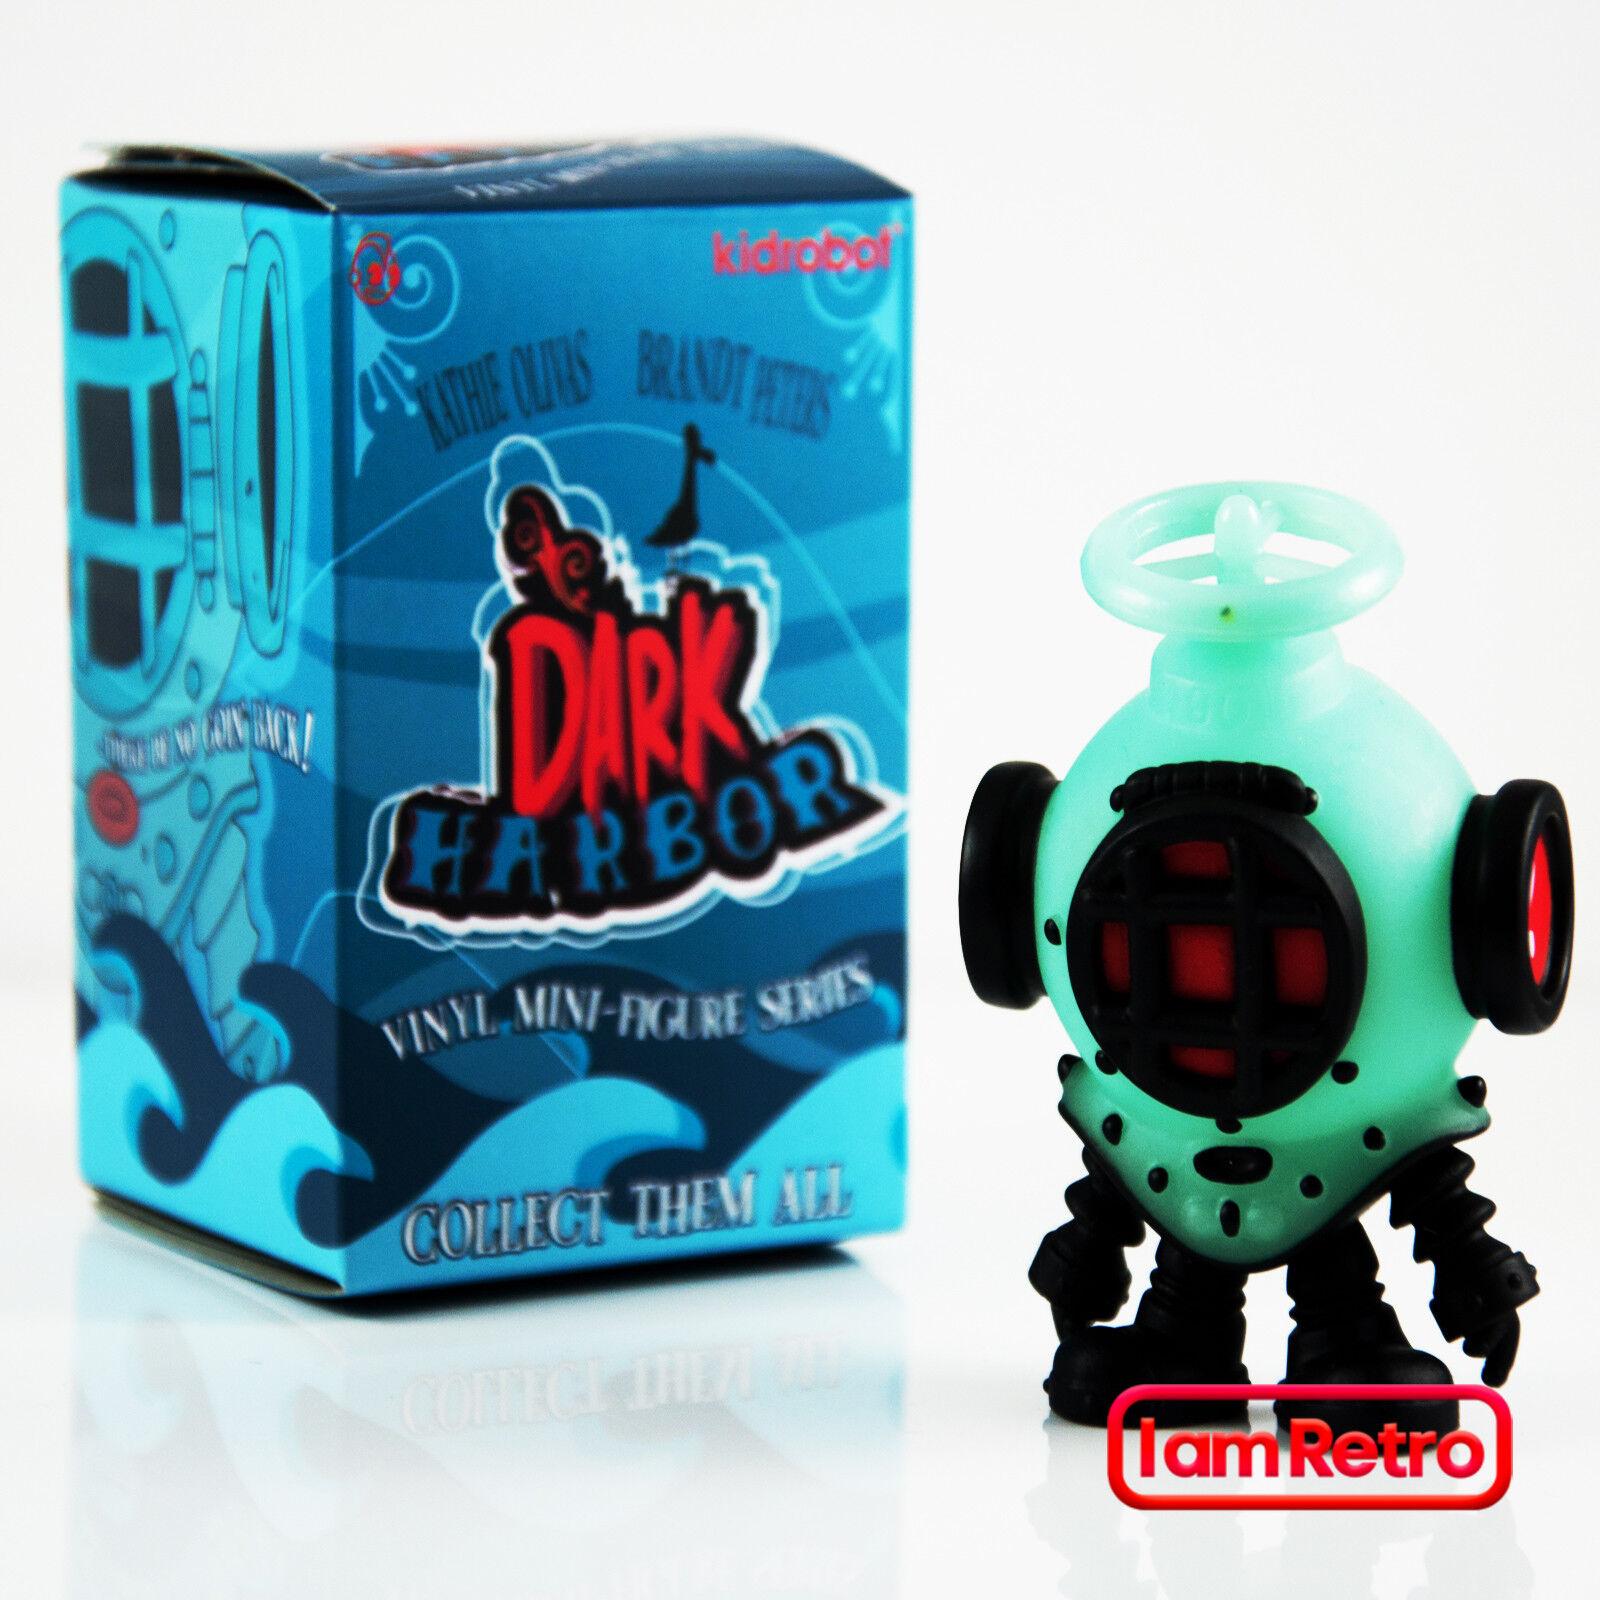 Deep Sea Heavy Footer Dark Harbor Mini Series Figure Brandt Peters x Kidrobot